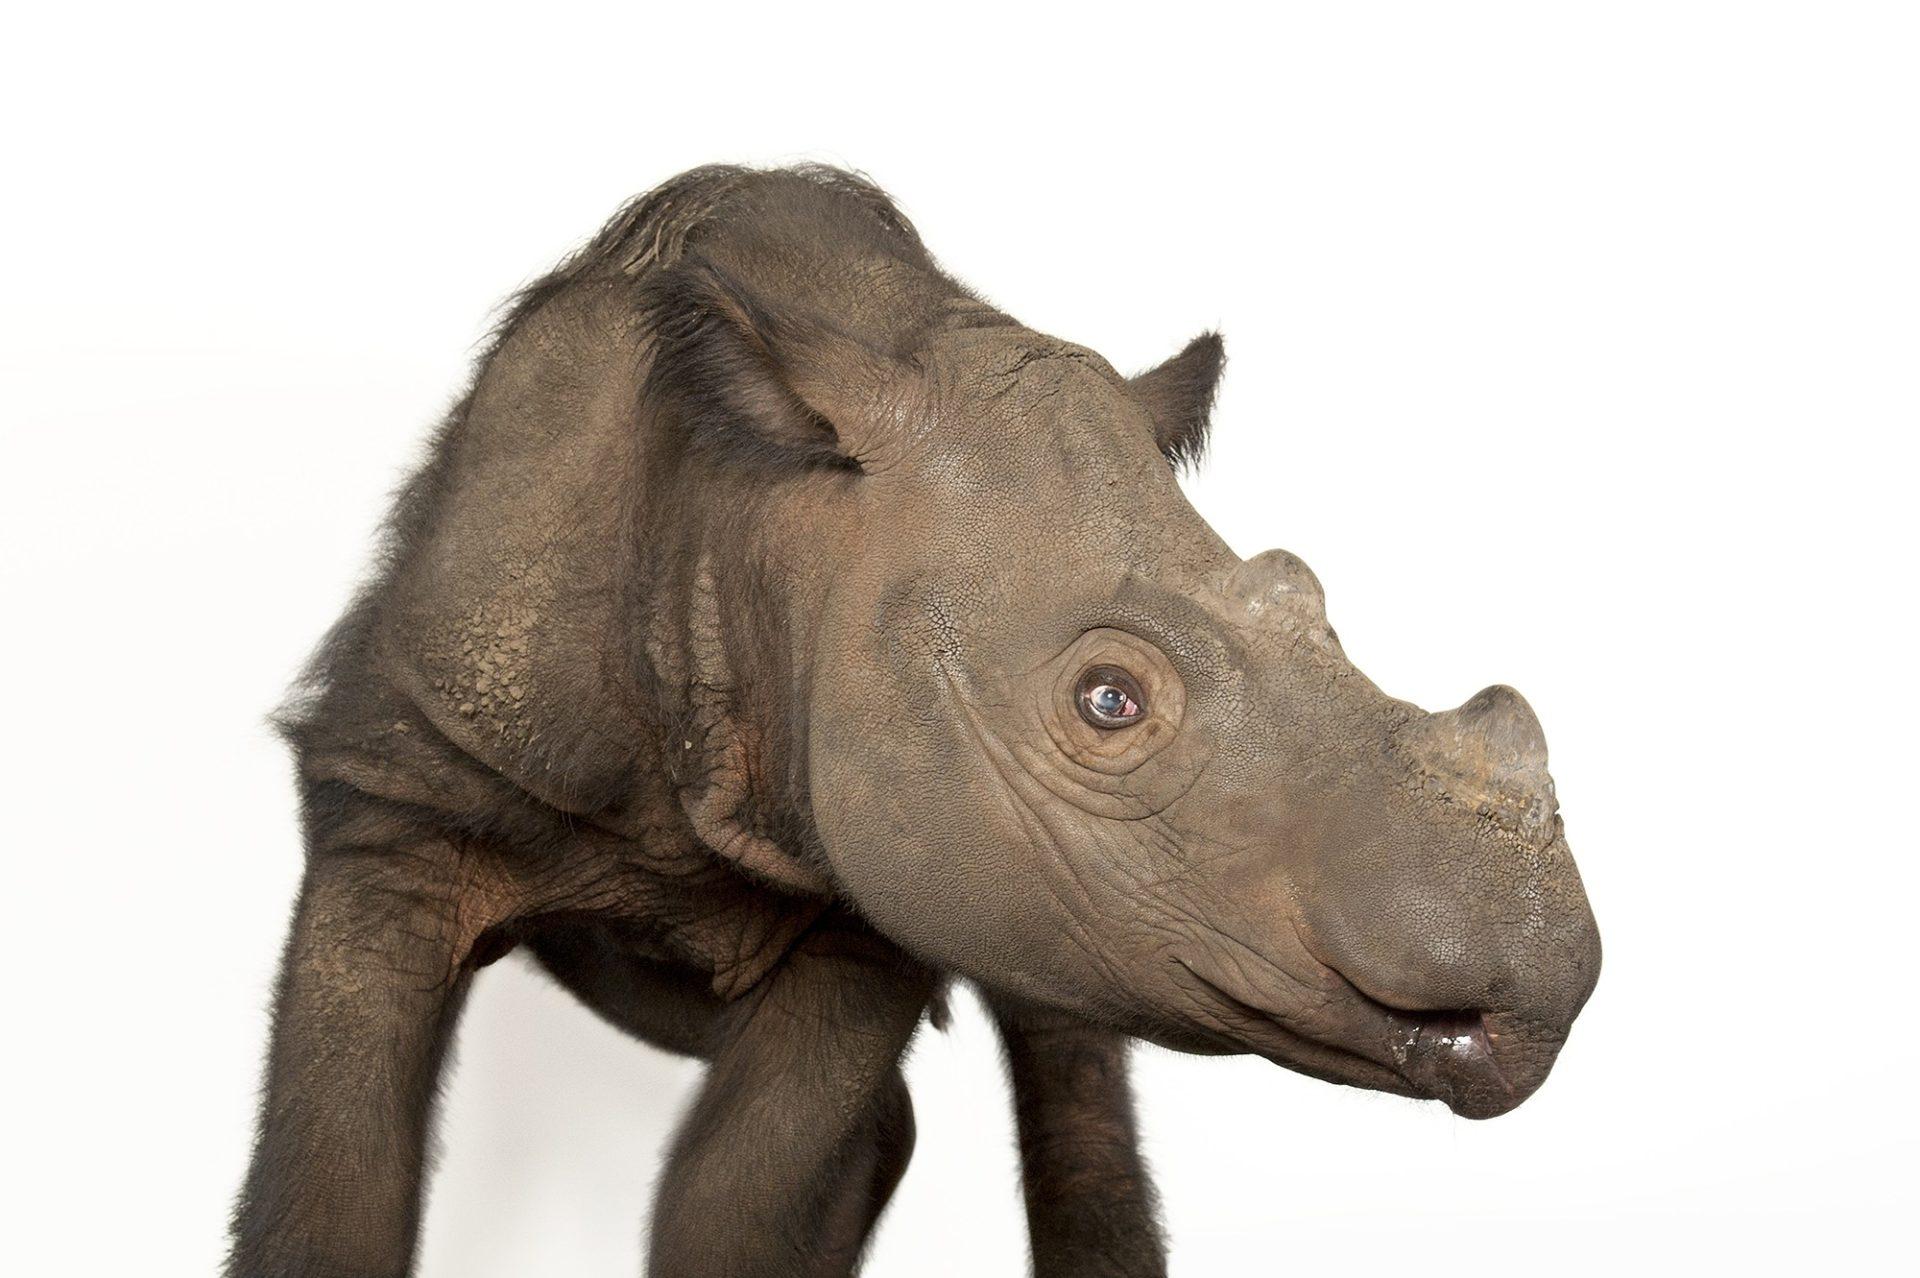 Photo: Harapan, a four-year-old male Sumatran rhino (Dicerorhinus sumatrensis), at White Oak Conservation Center.